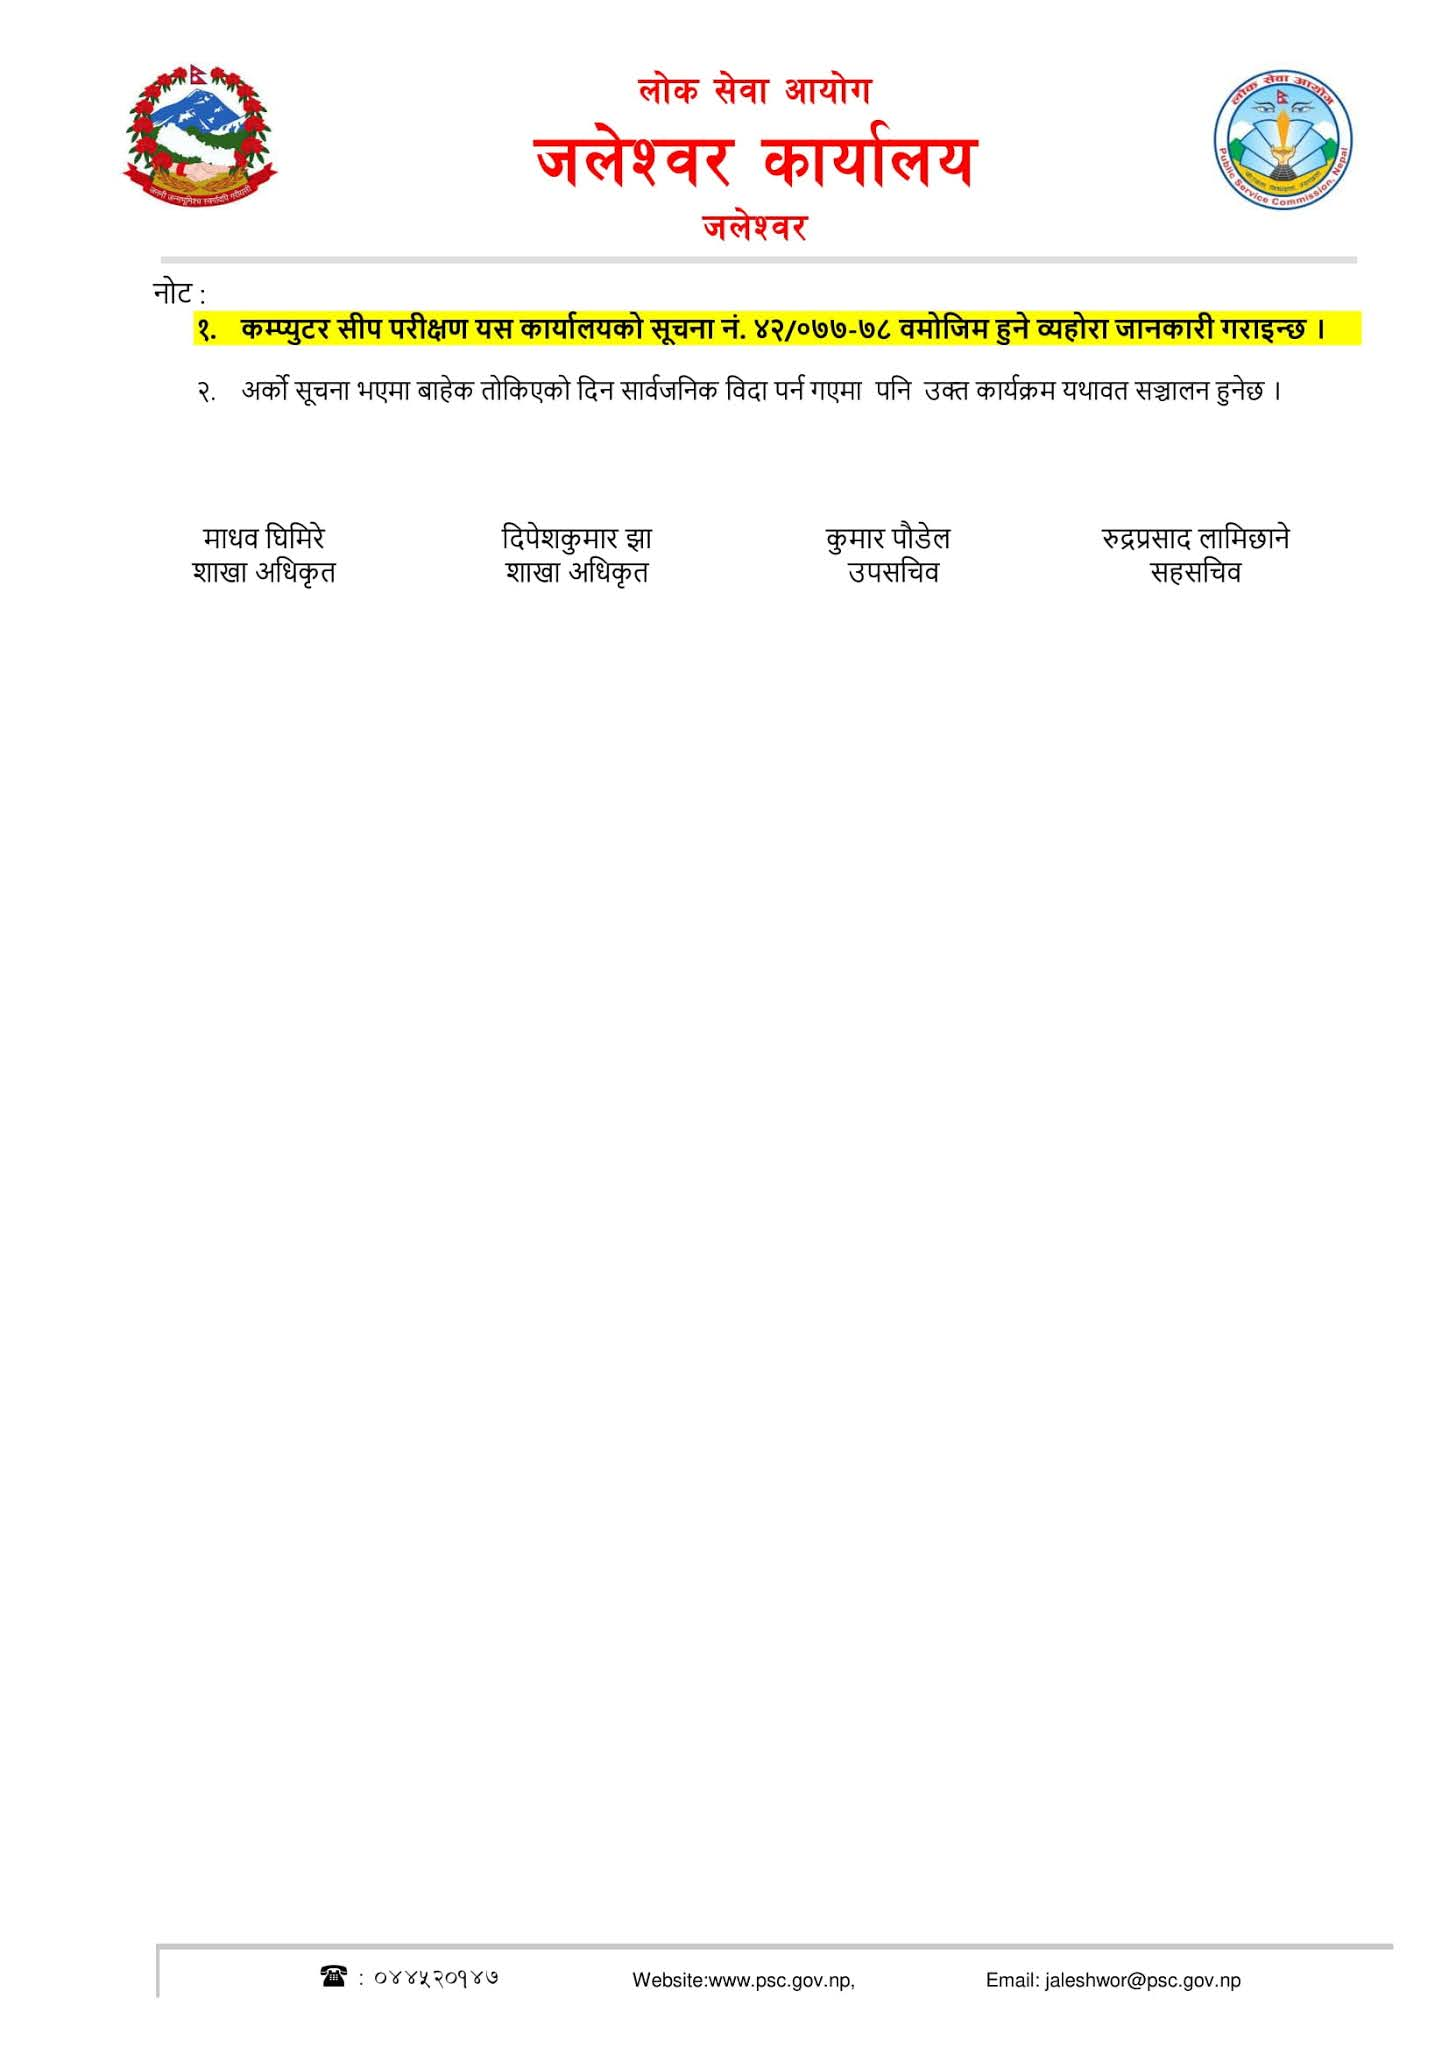 (NASU Revenue - Jaleshwor ) Lok Sewa Aayog Written Exam Result & Exam Schedule